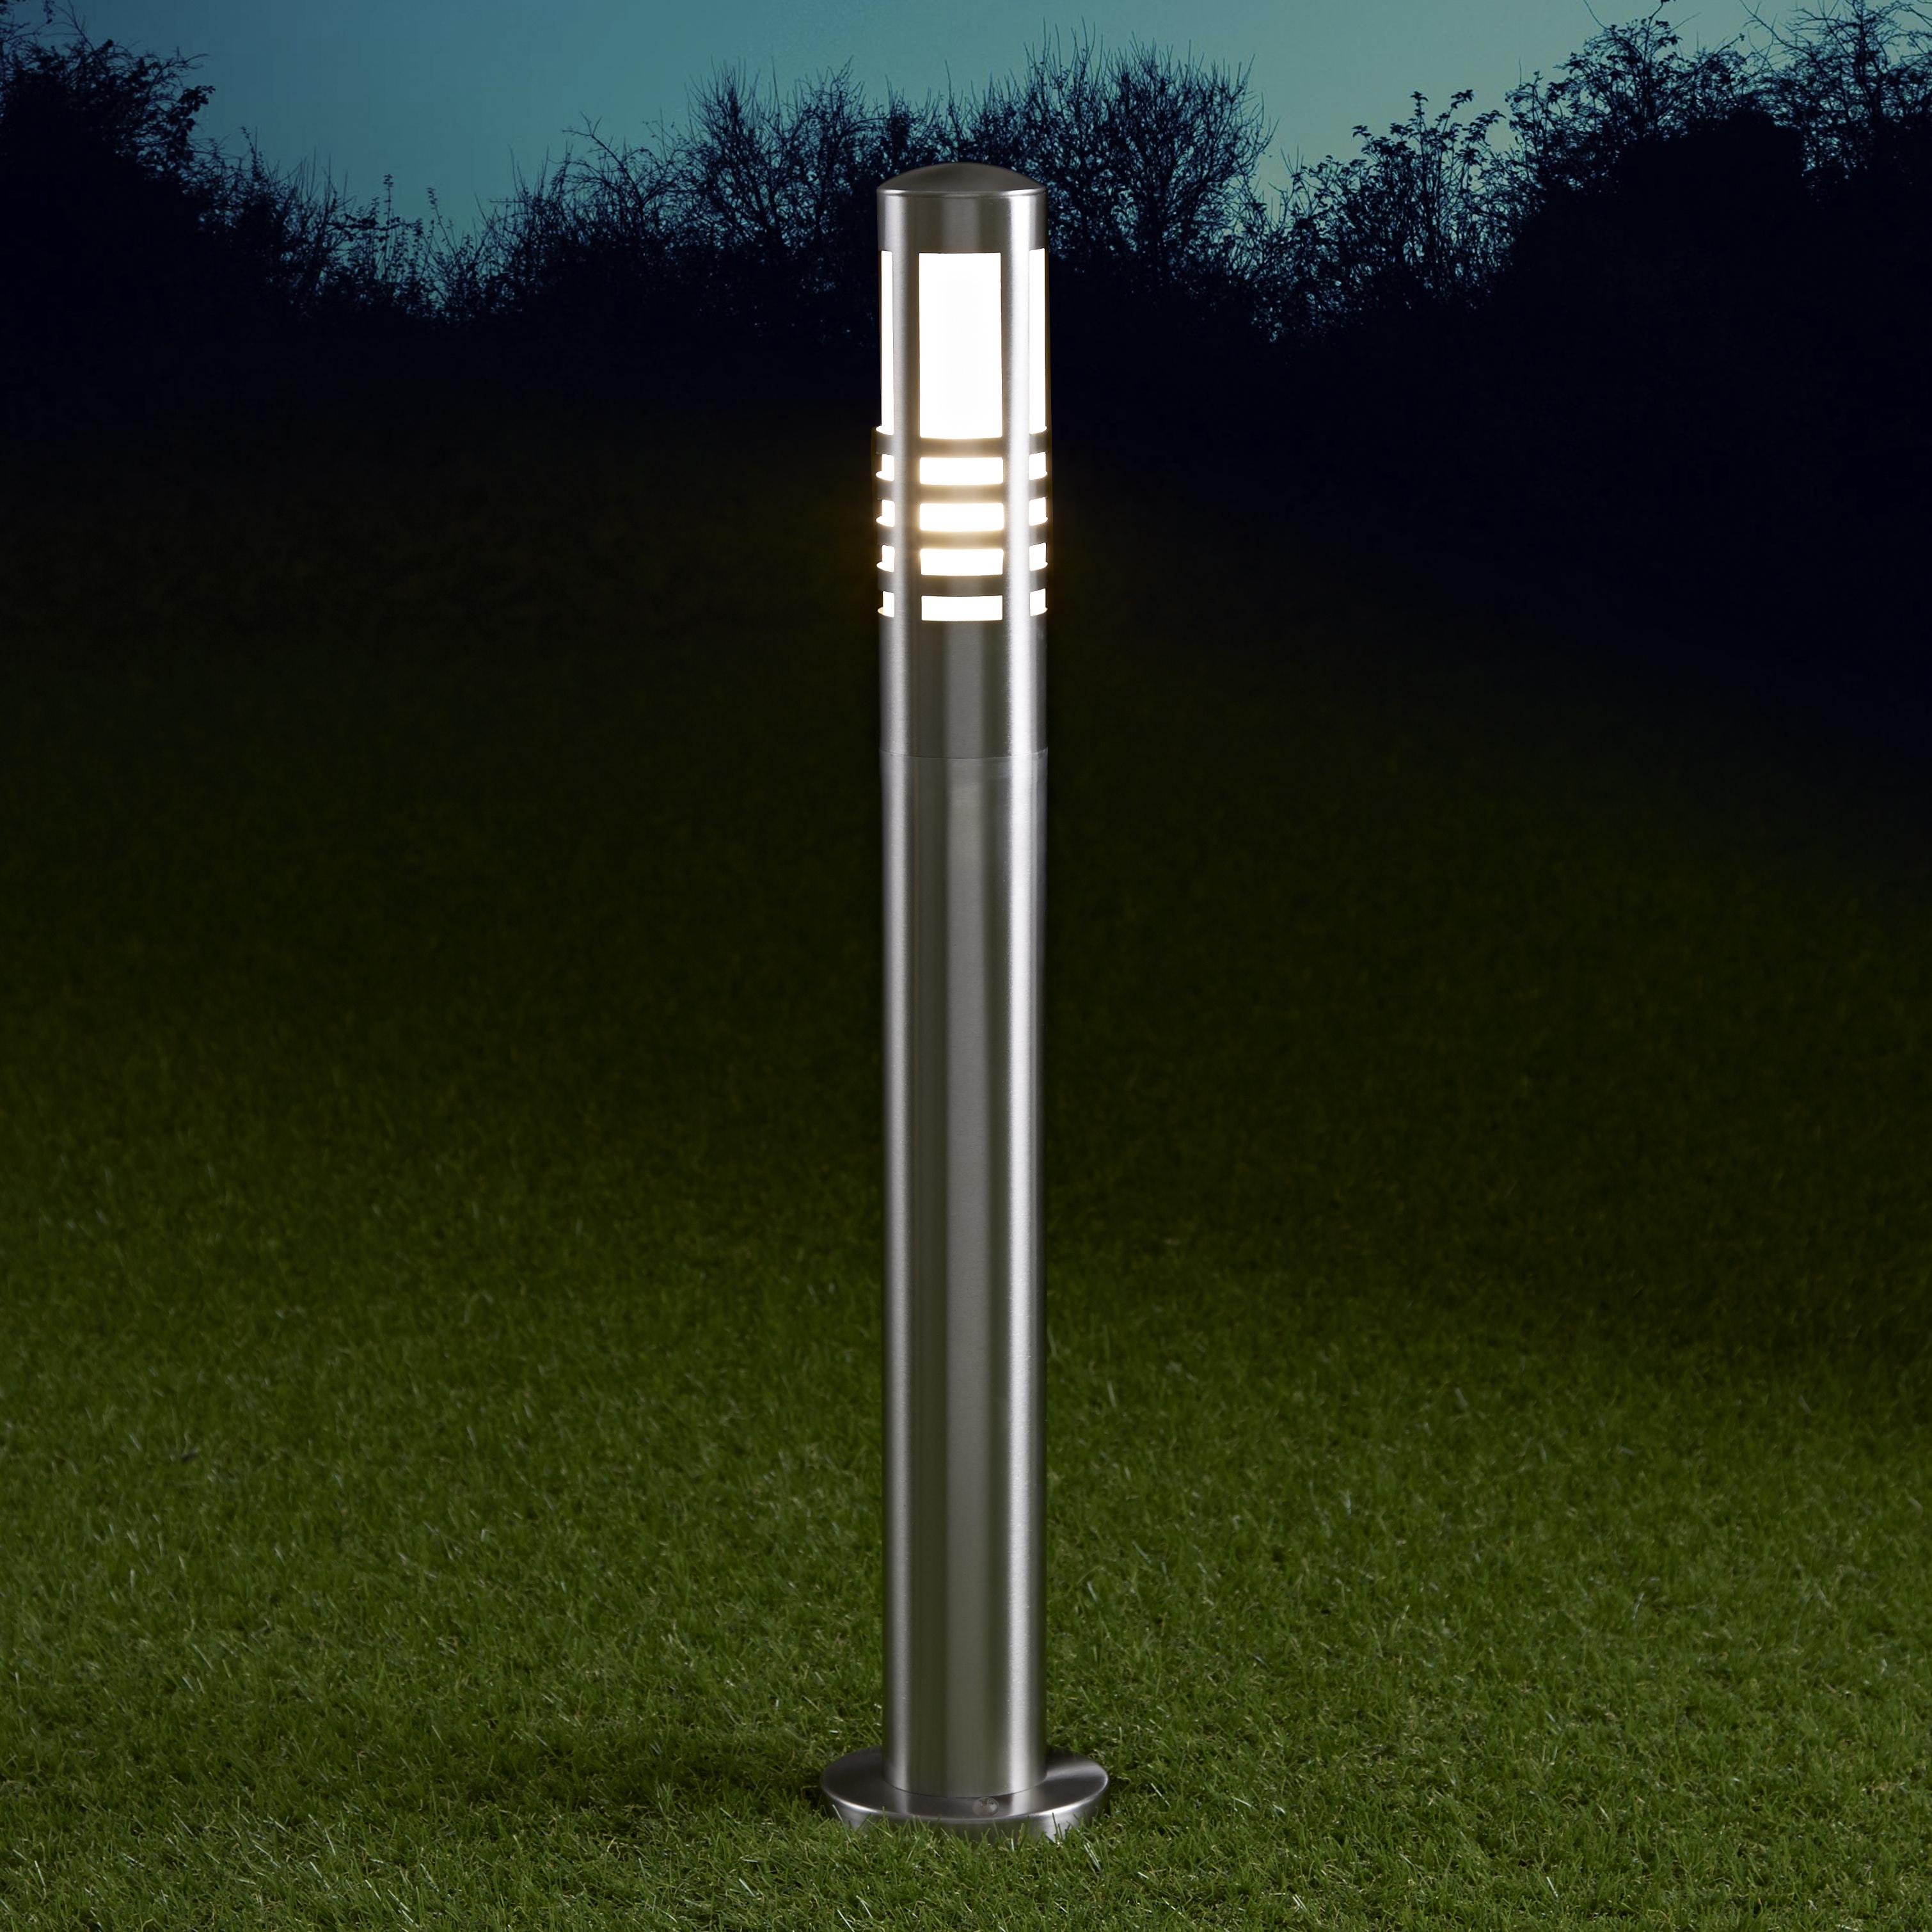 Orleans Dimbare Sokkellamp 60cm RVS E27 IP44